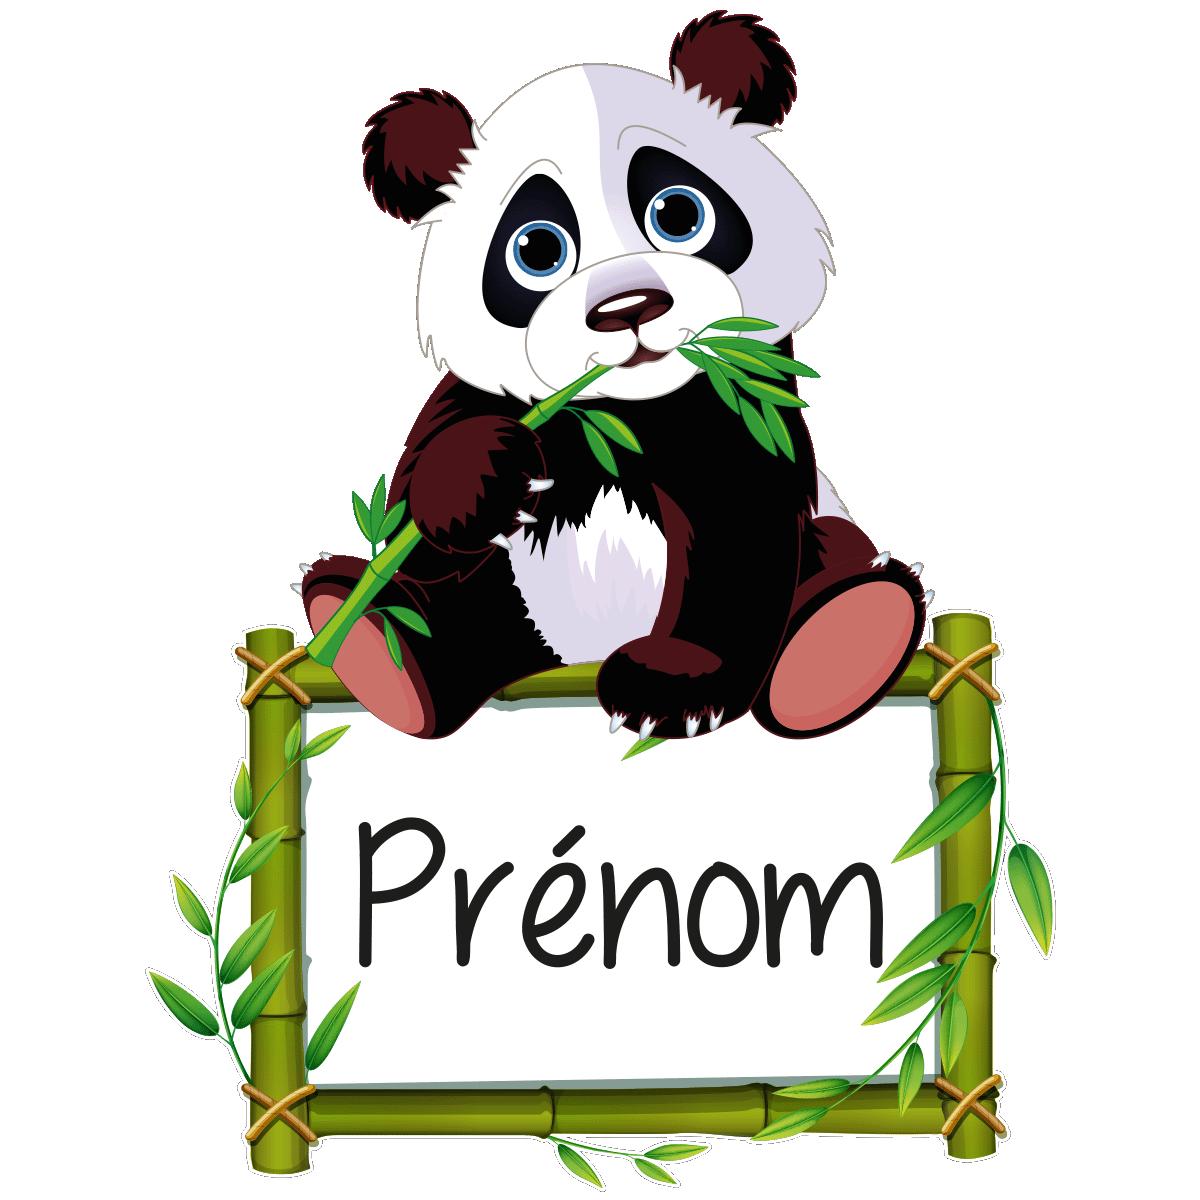 sticker pr nom personnalisable panda et son bambou. Black Bedroom Furniture Sets. Home Design Ideas